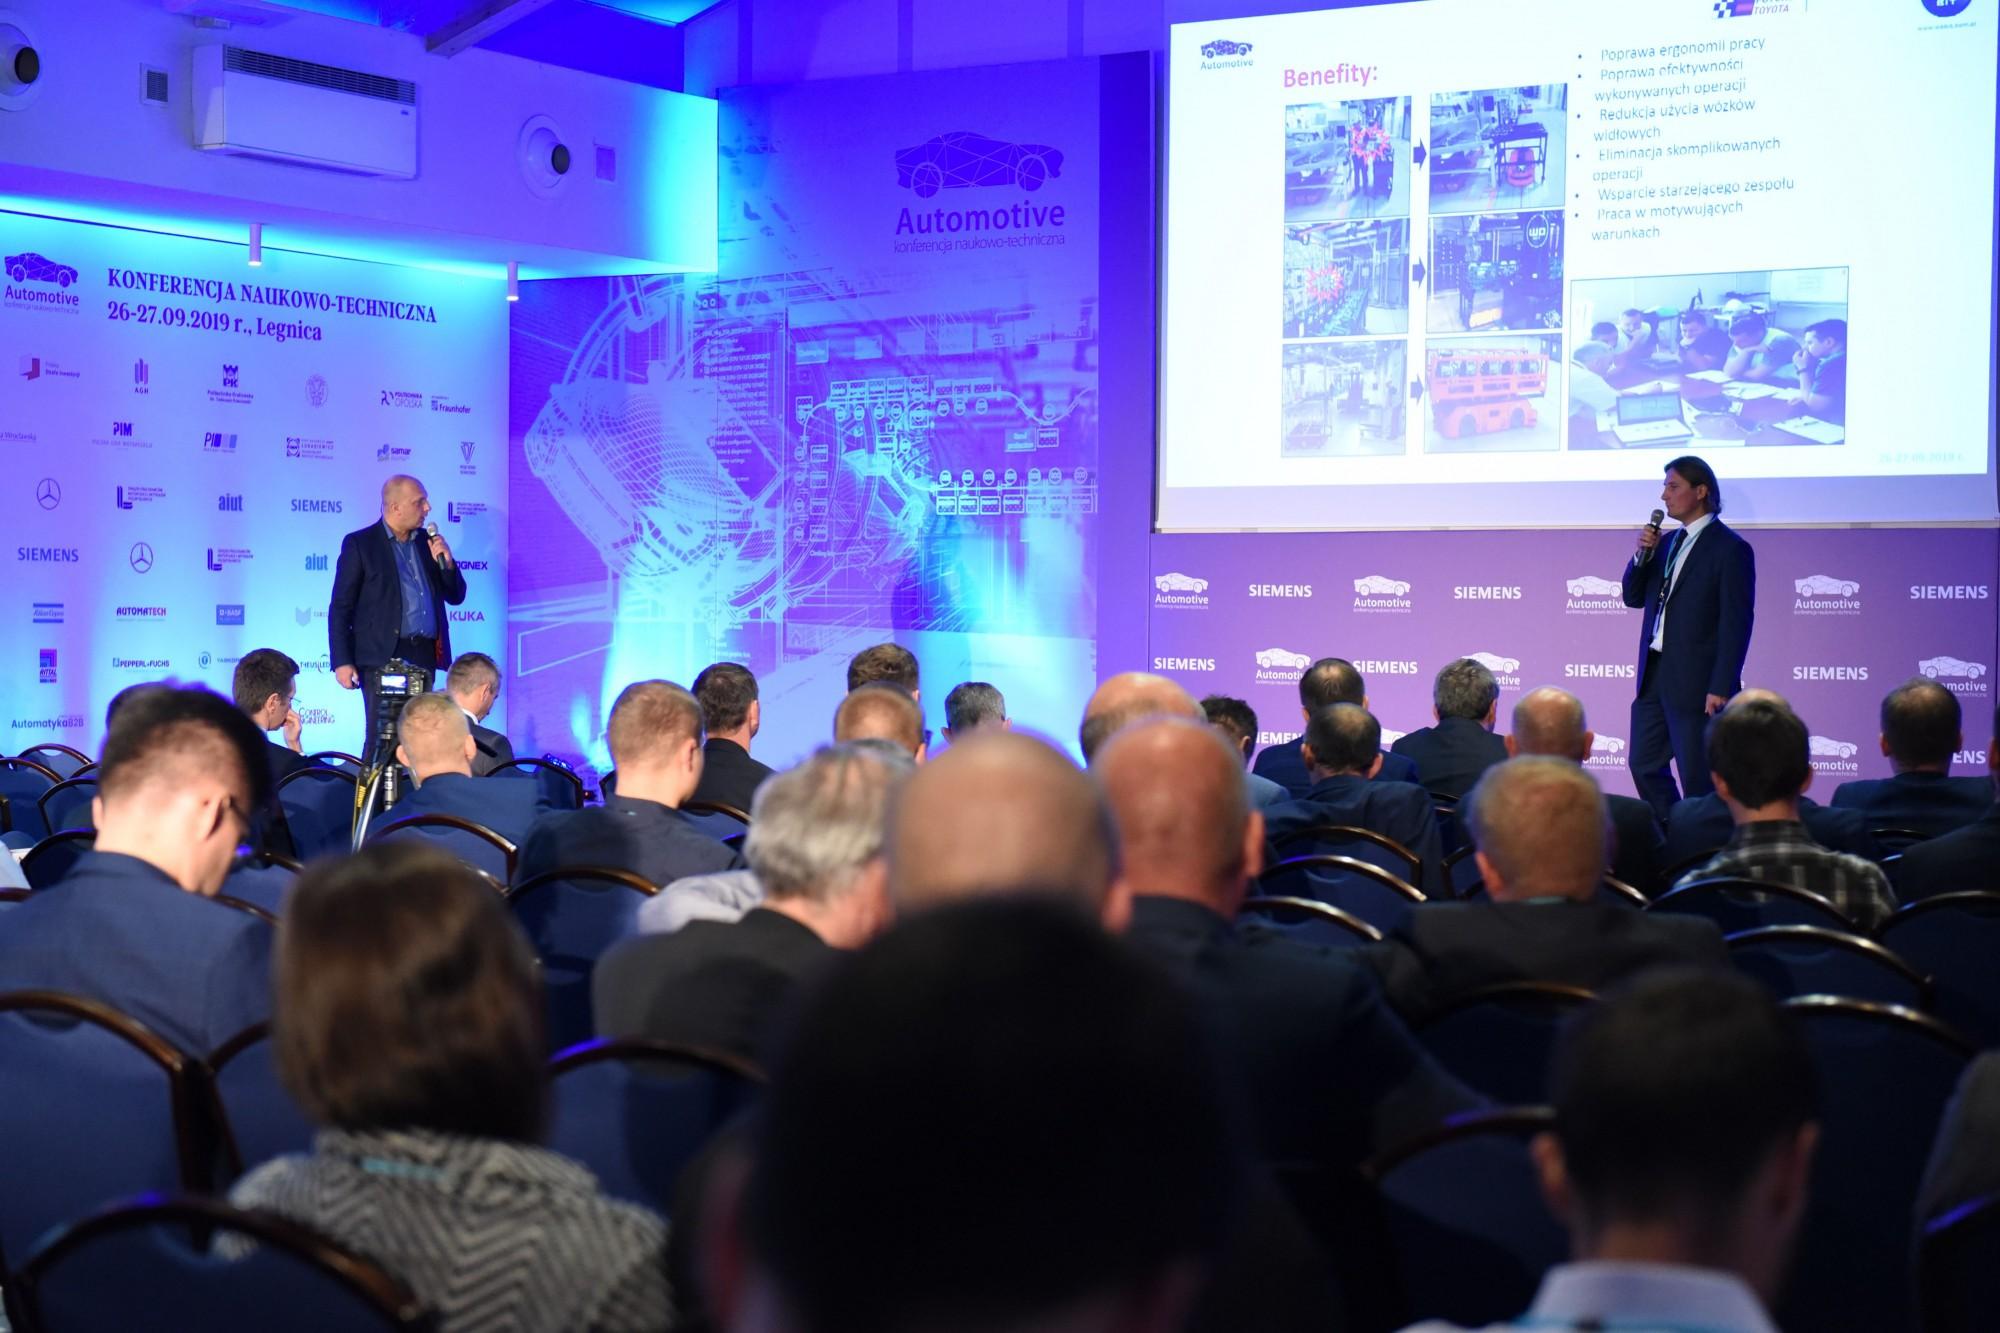 Konferencja Automotive_WObit